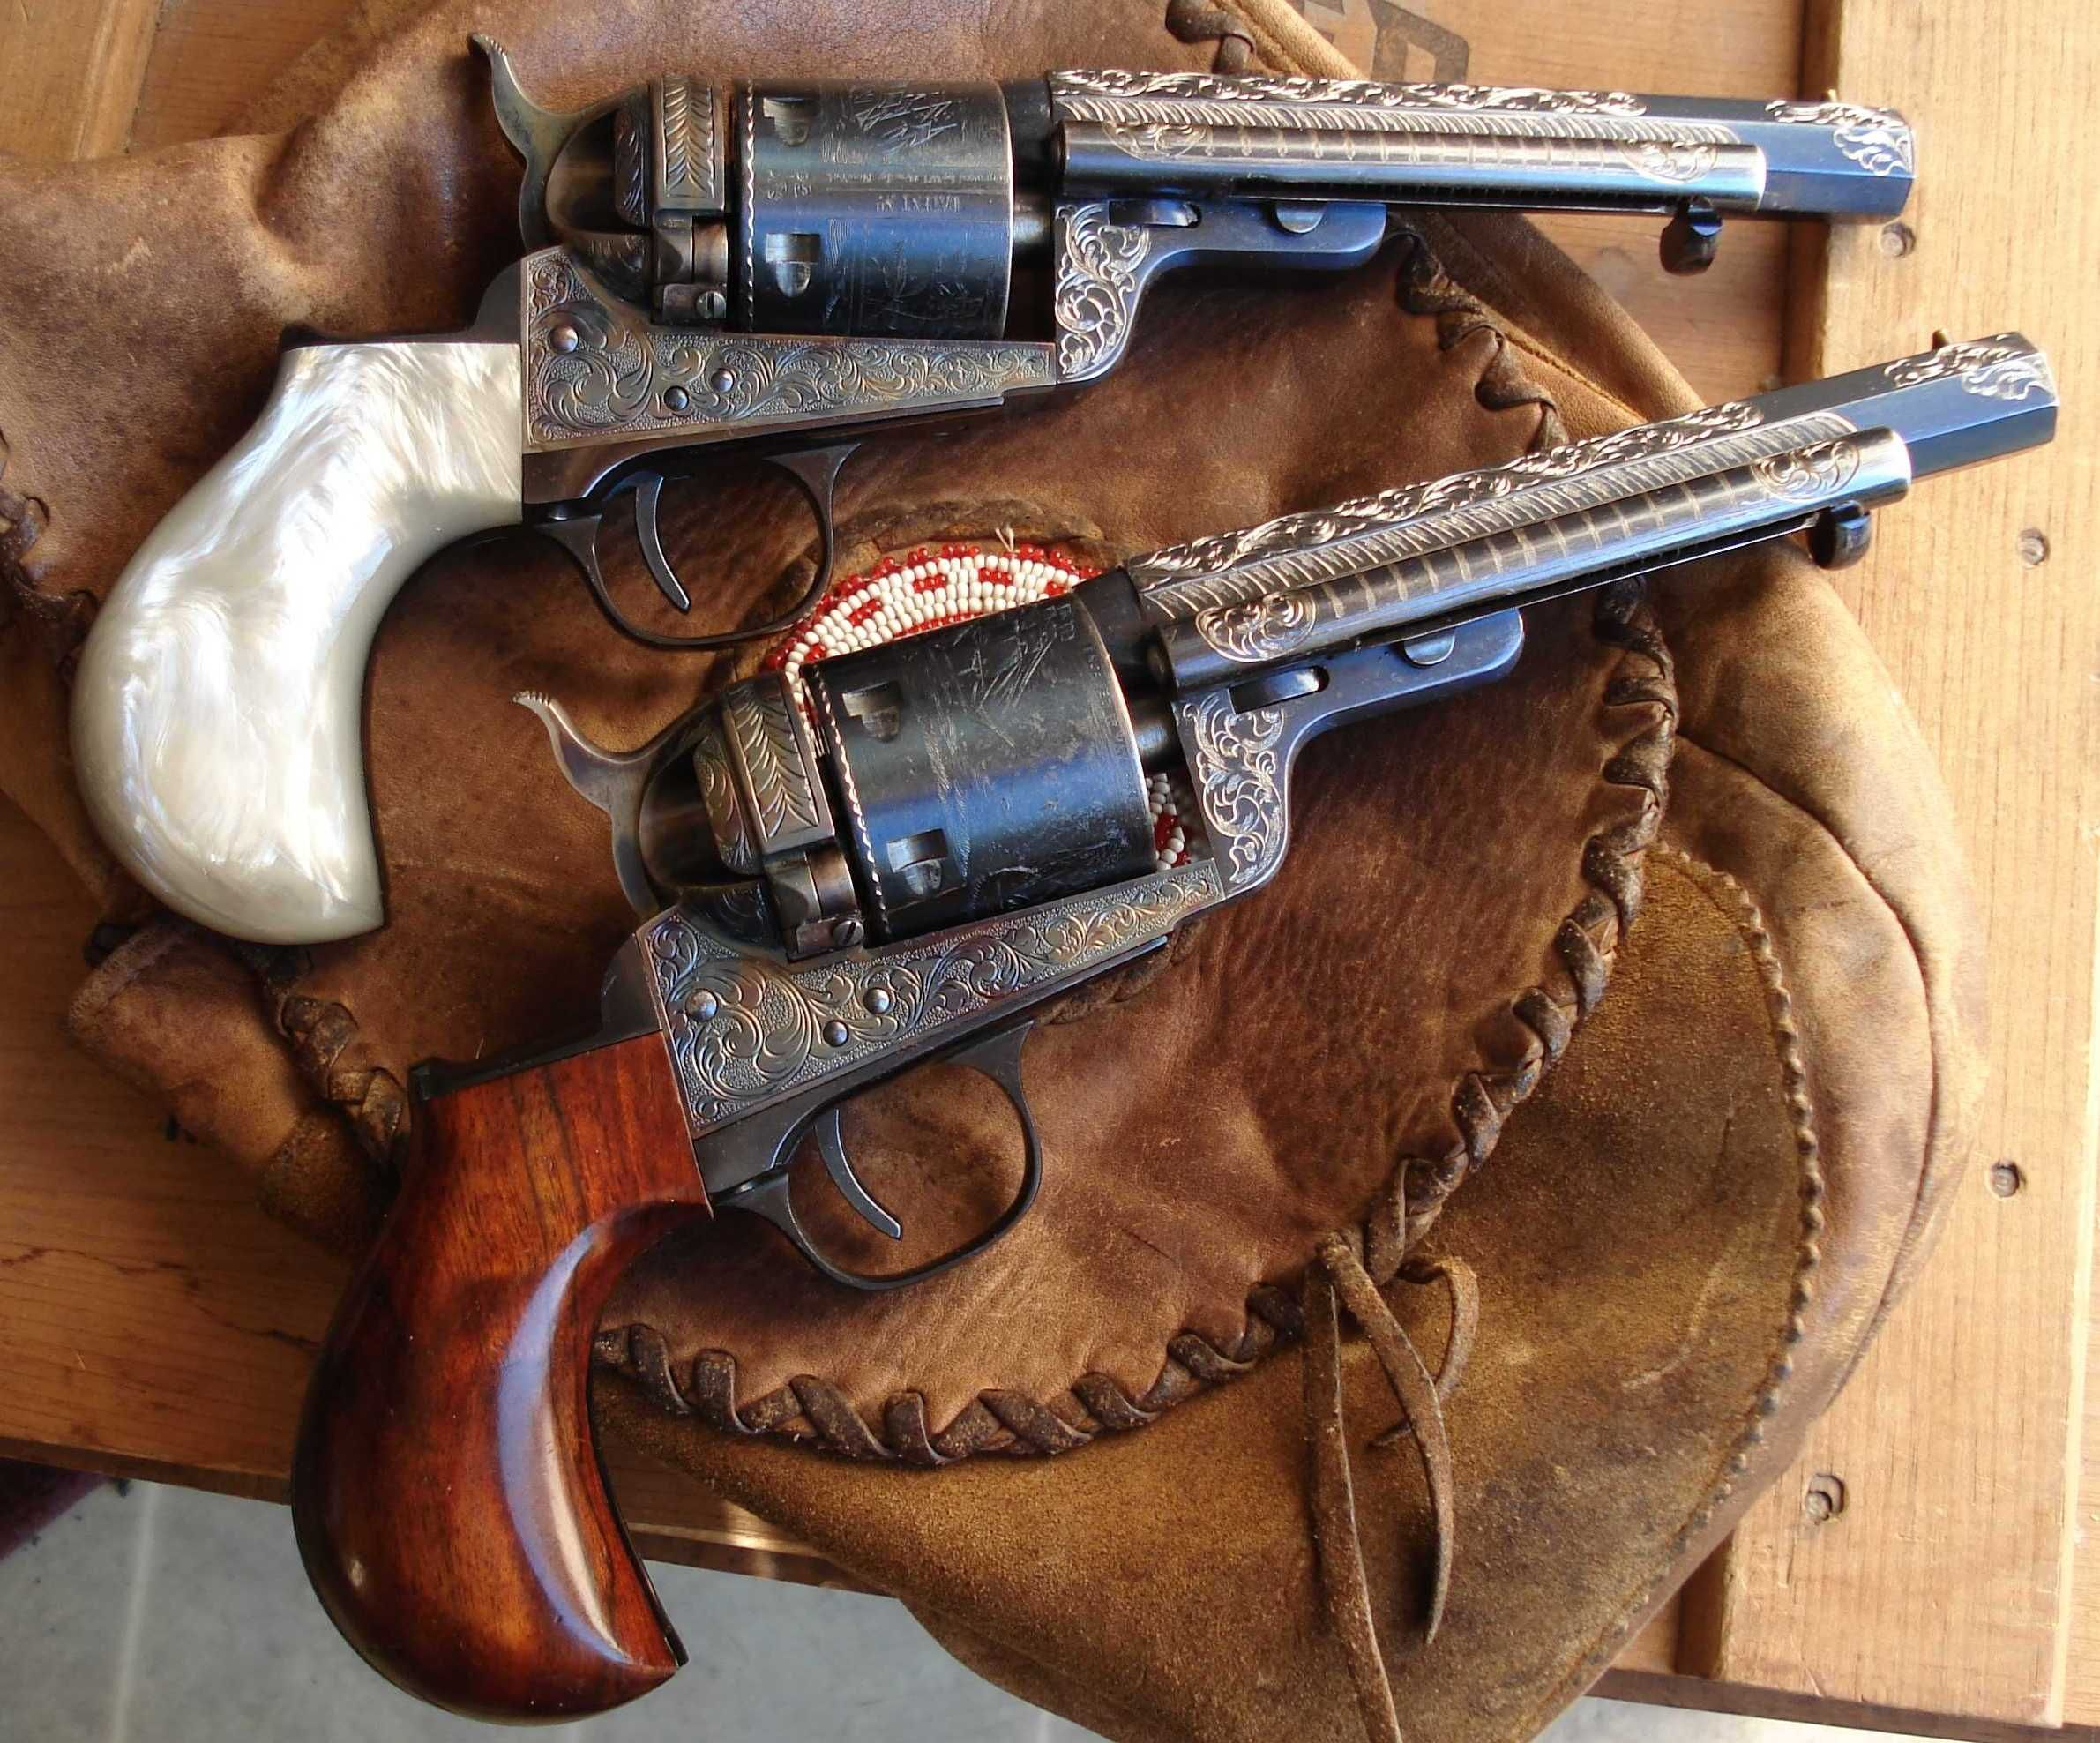 Double pistol handgun revolver gun display case cabinet rack shadowbox - 1851 Mason Richards Conversions Cowboy Guns Pinterest Guns Weapons And Revolvers